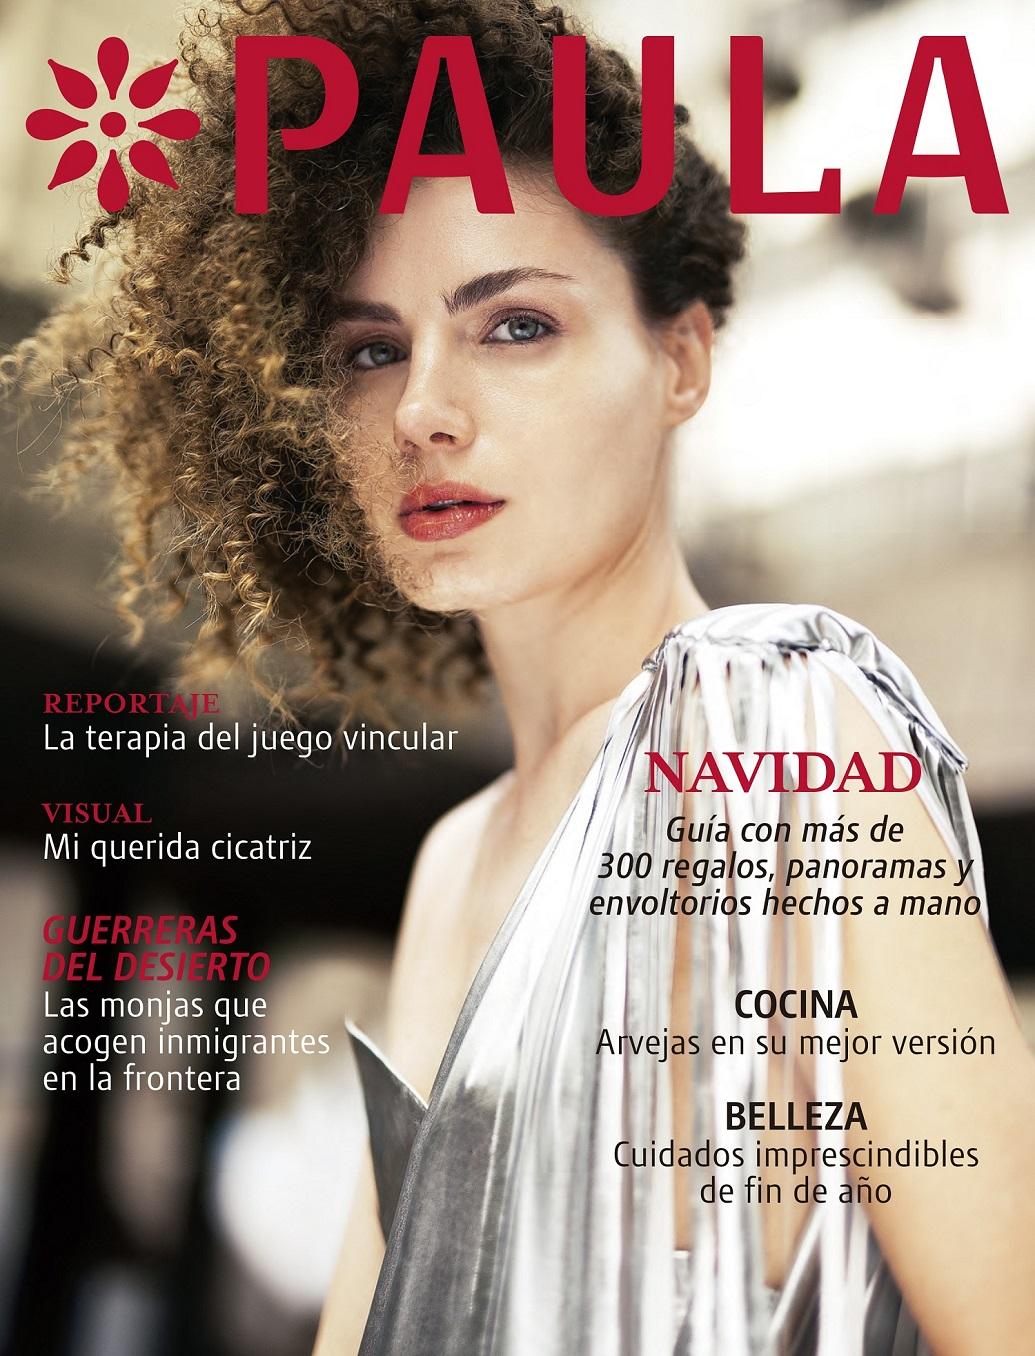 Helena Spilere paula Chile 2016.jpg